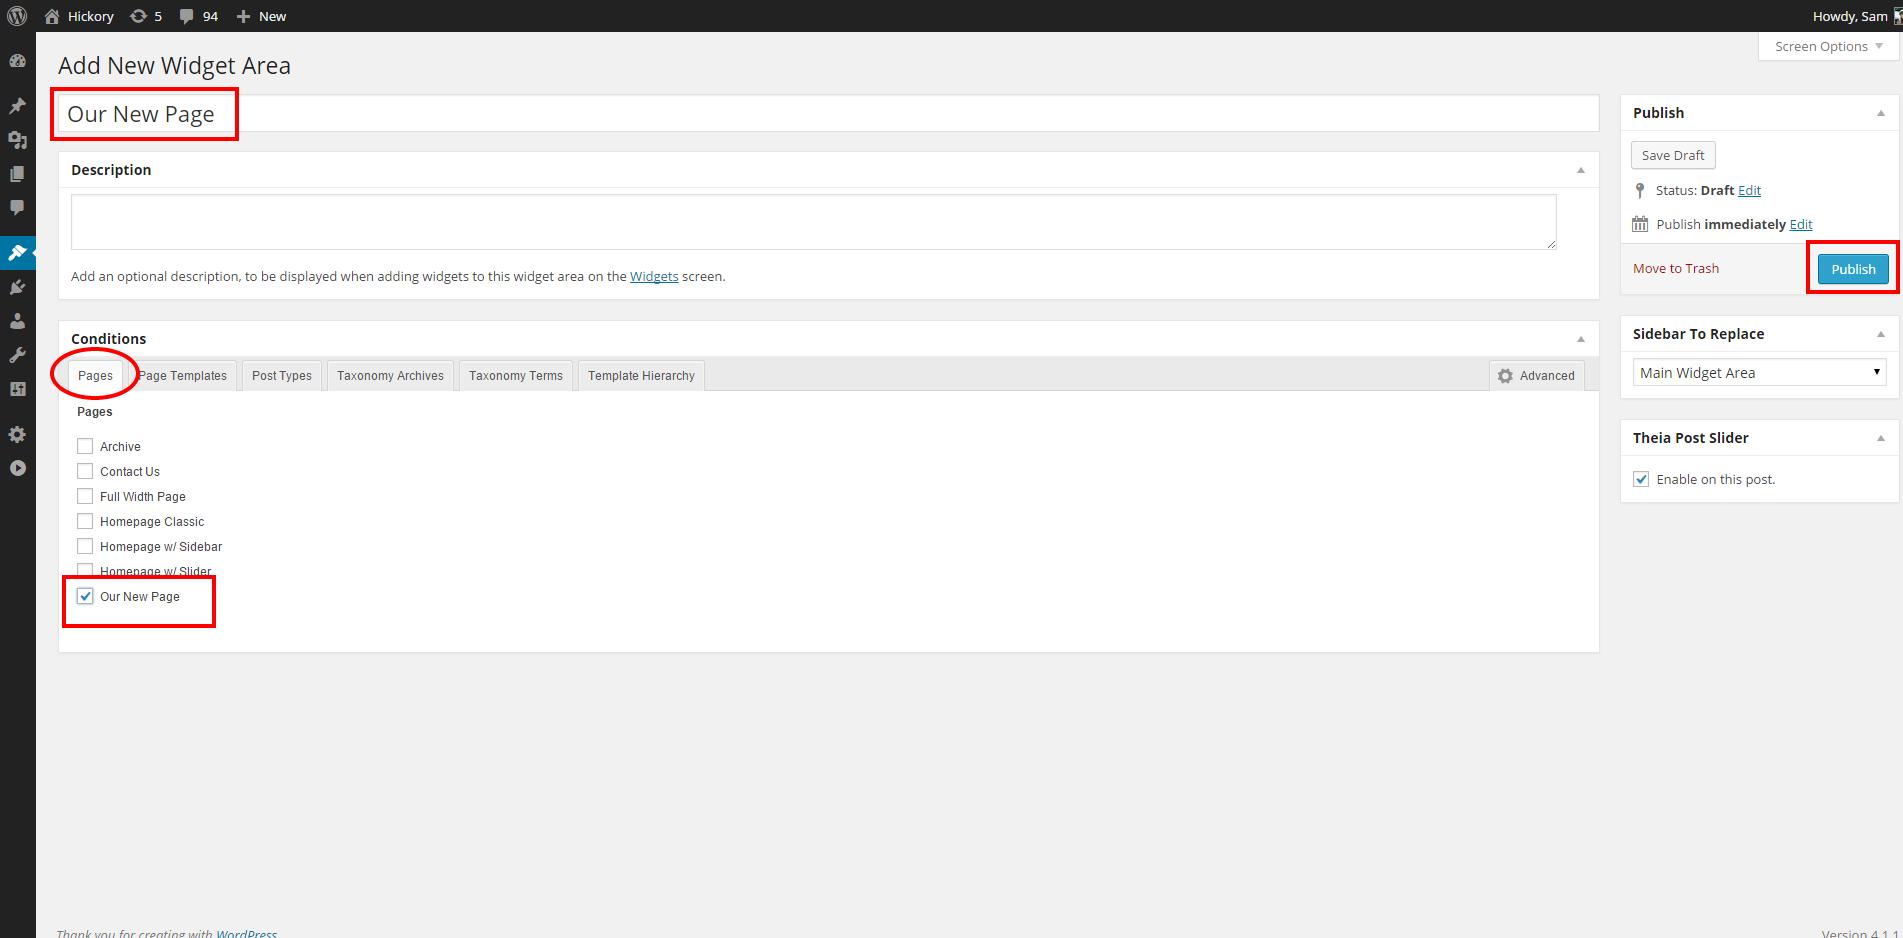 Hickory Widgetized Page Screenshot #2